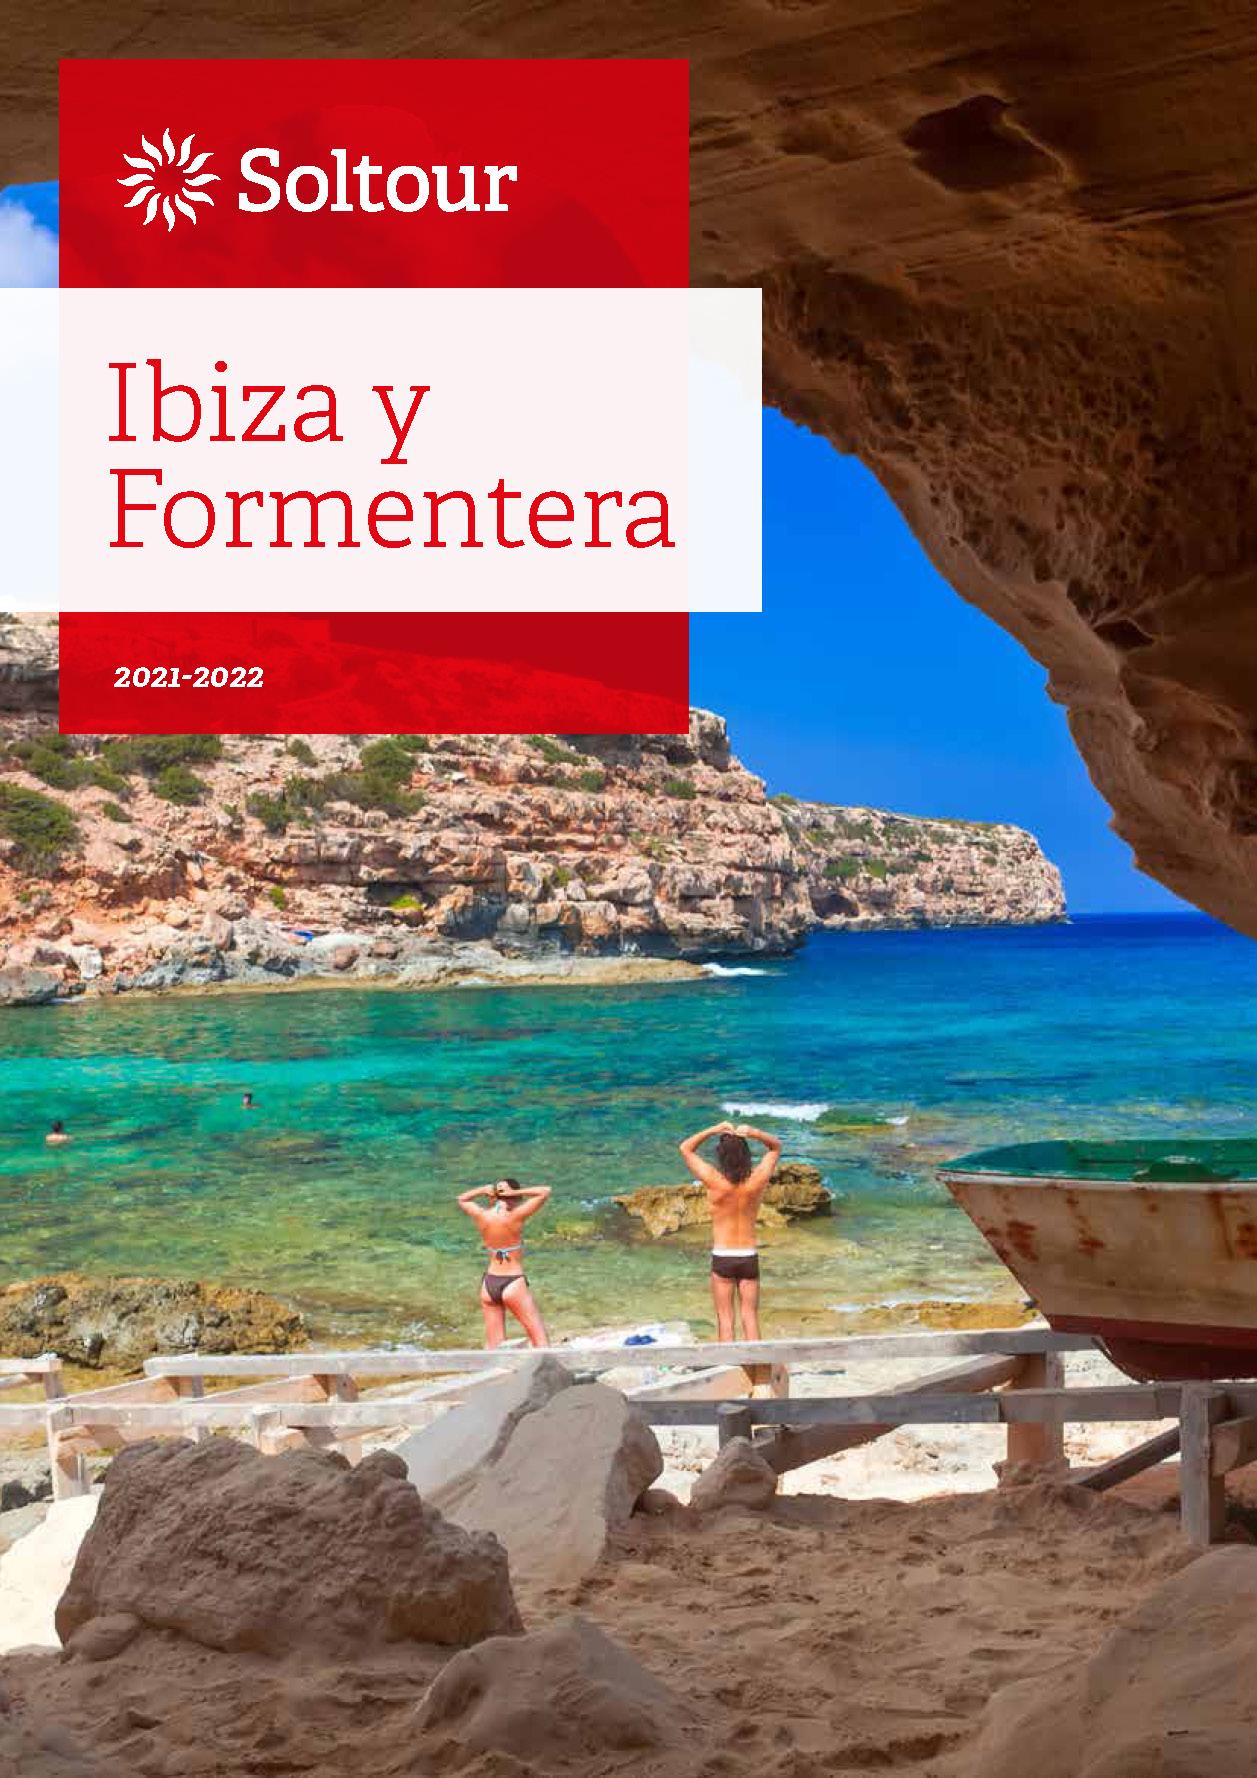 Catalogo Soltour Ibiza y Formentera 2021-2022